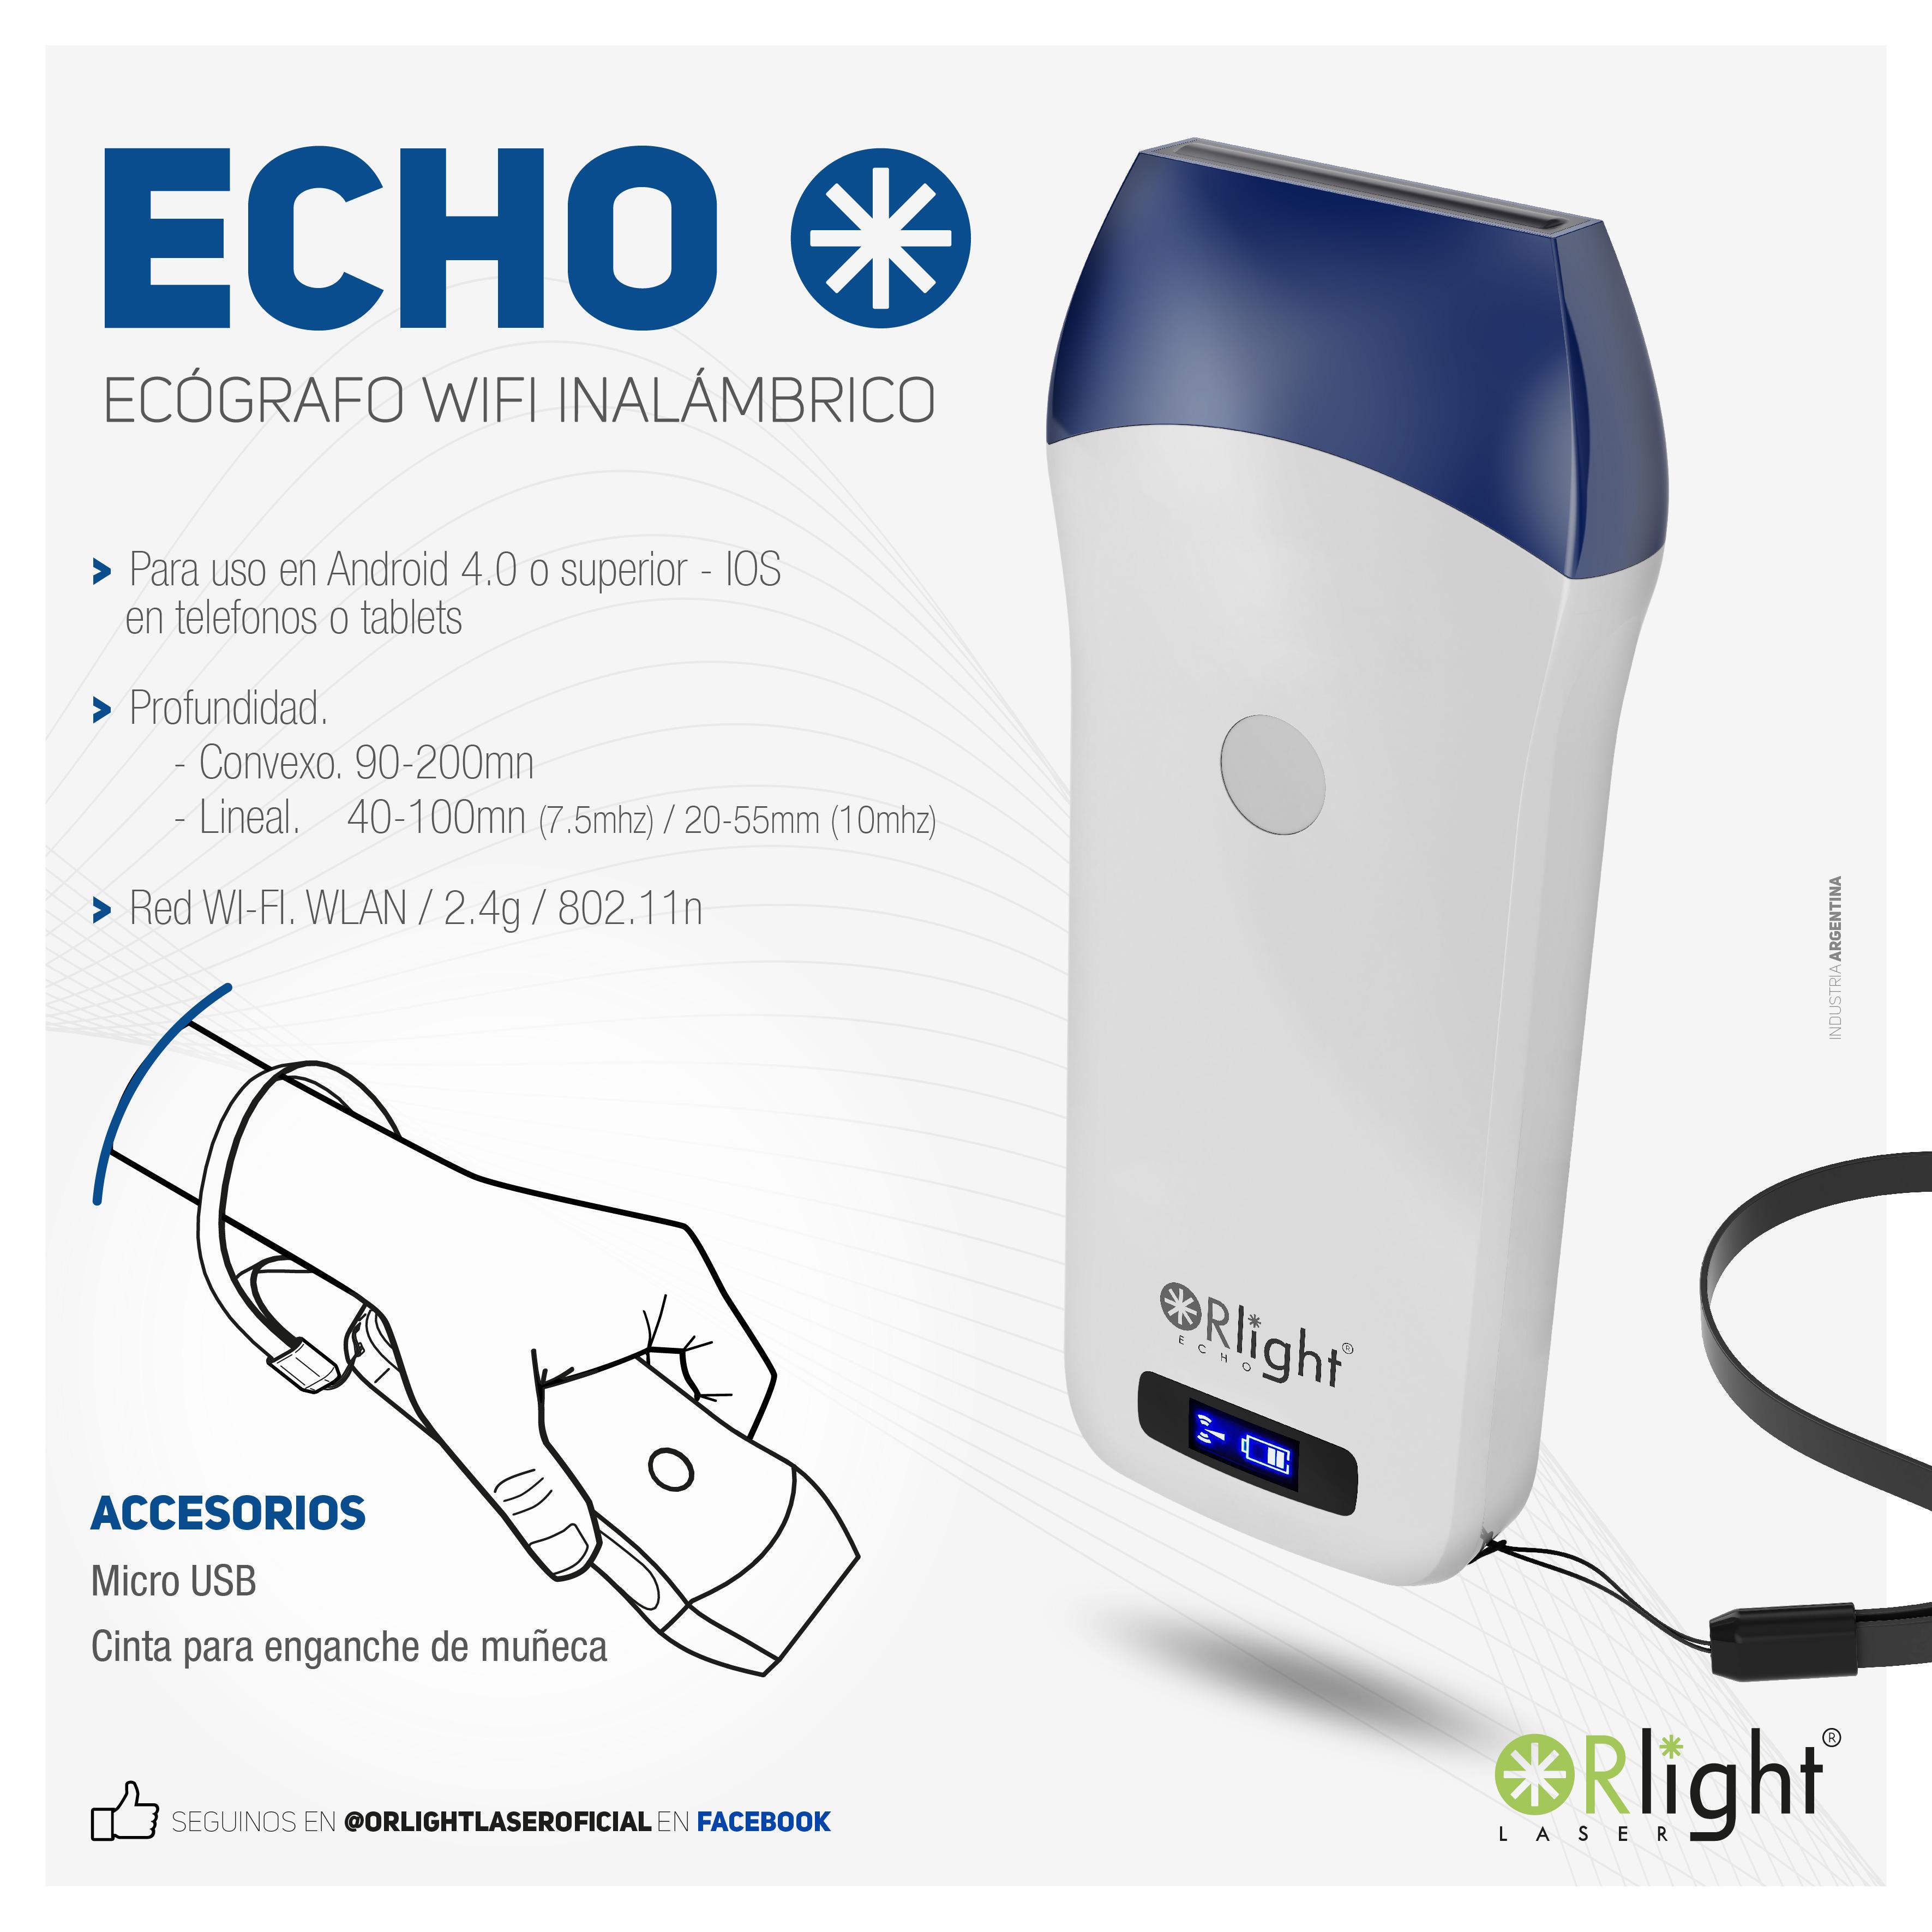 01-ECHO-900-2